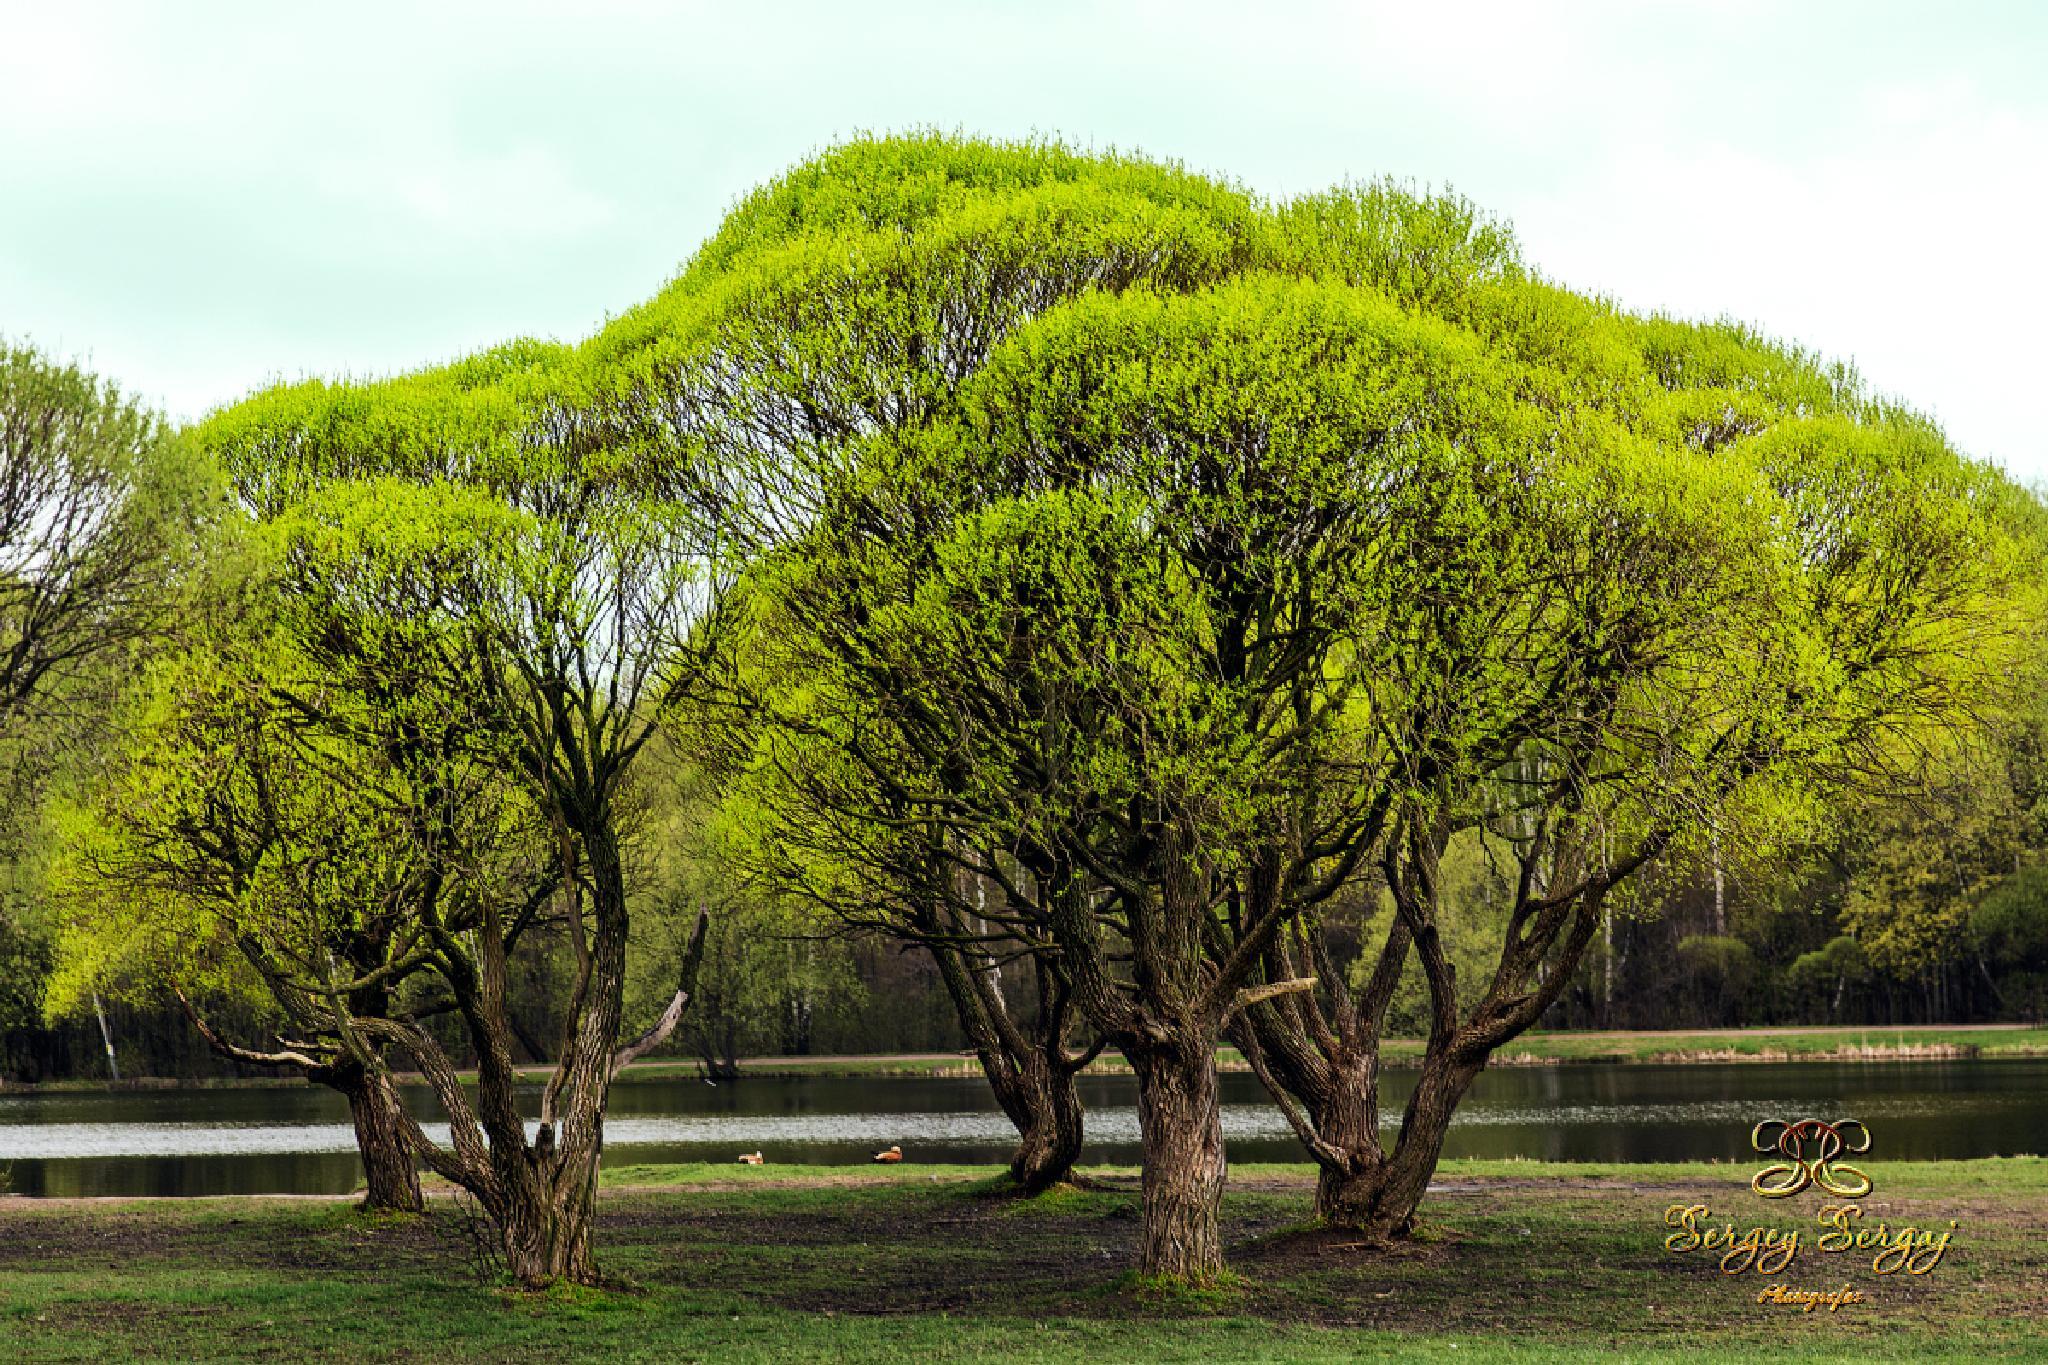 Spring trees by Sergey Sergaj